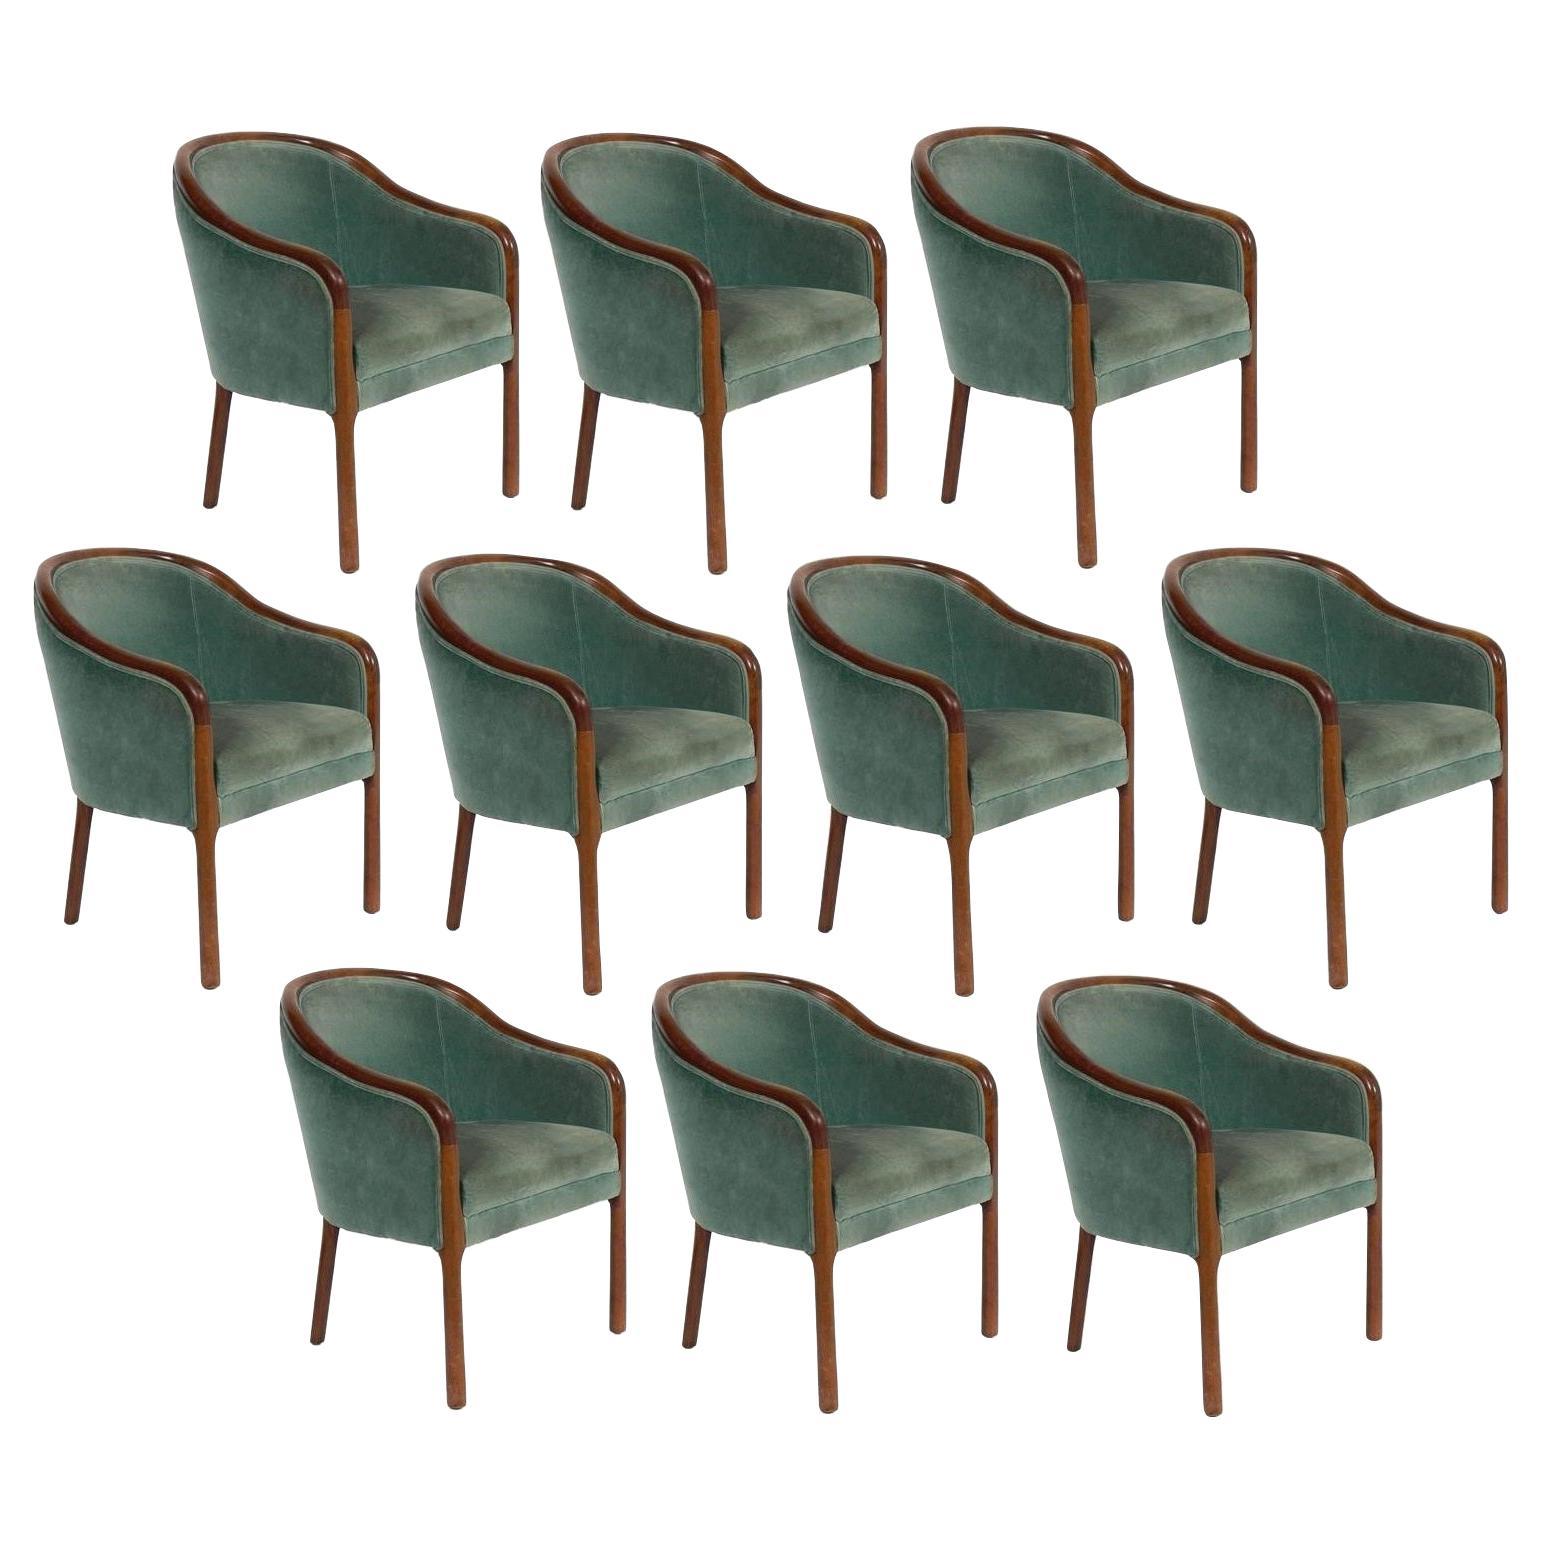 Wondrous Brickel Associates Furniture Chairs Sofas Tables More Dailytribune Chair Design For Home Dailytribuneorg